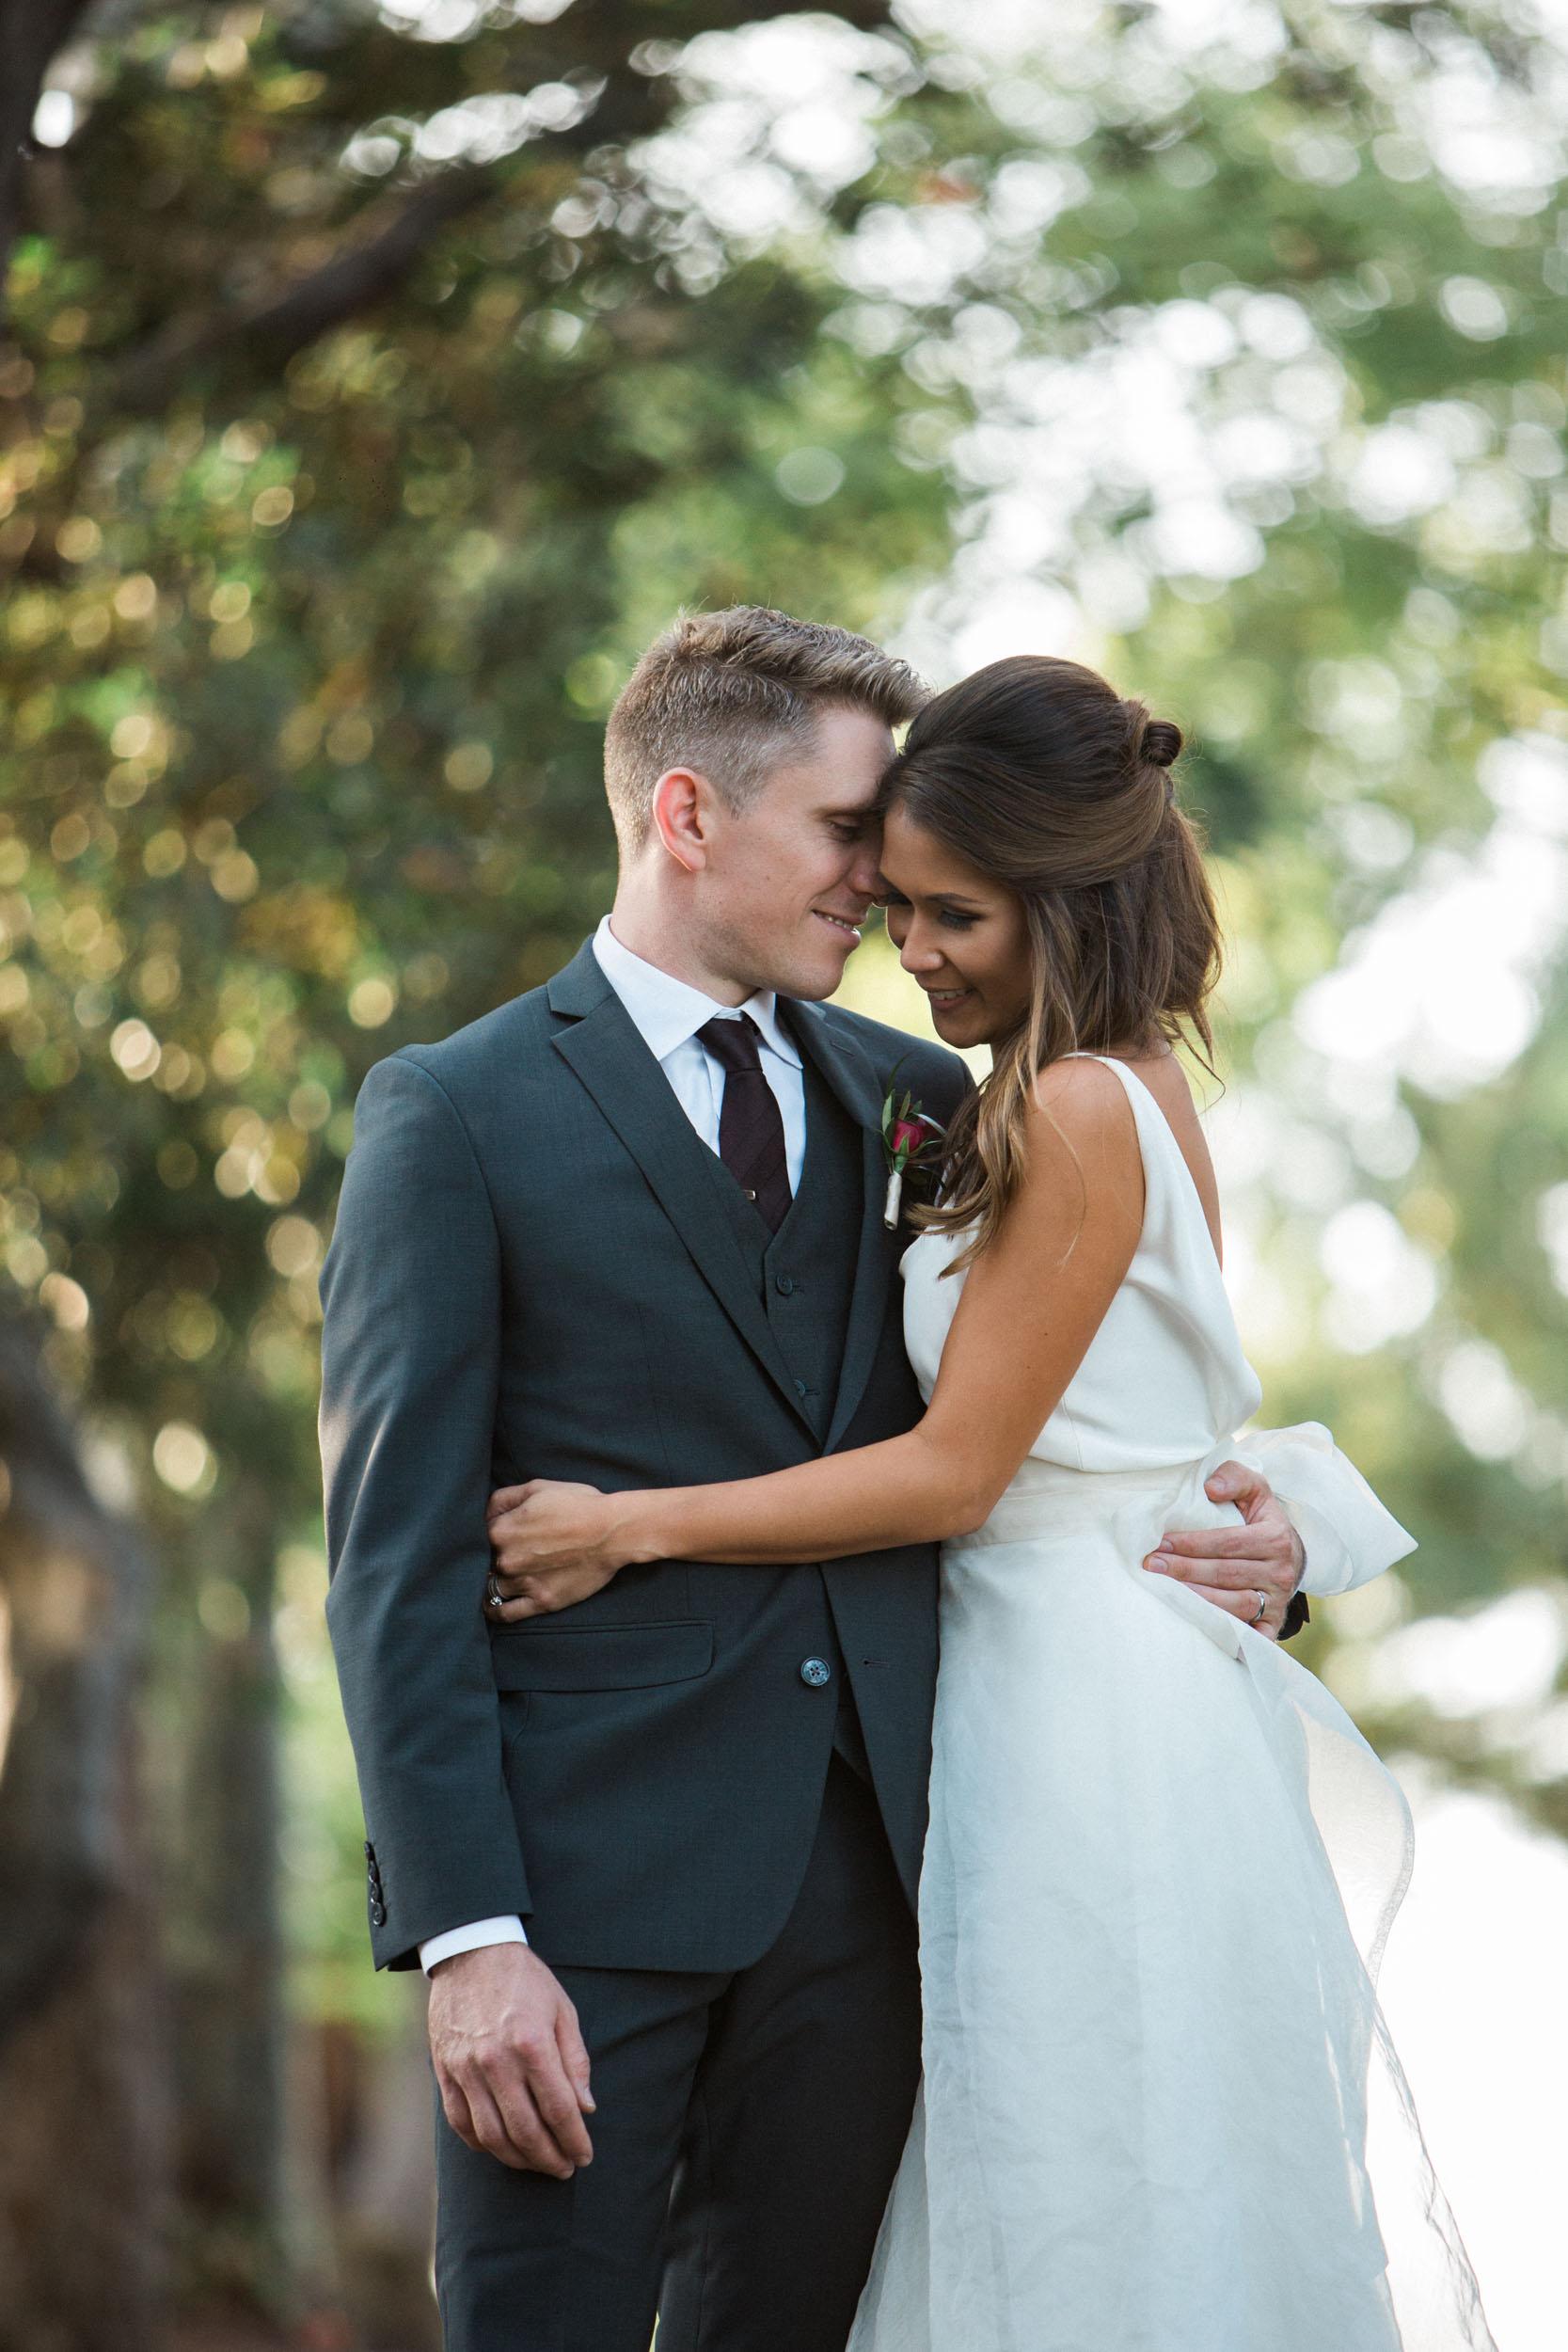 BKM-Photography-Highland-Park-Los-Angeles-Backyard-Wedding-0039.jpg